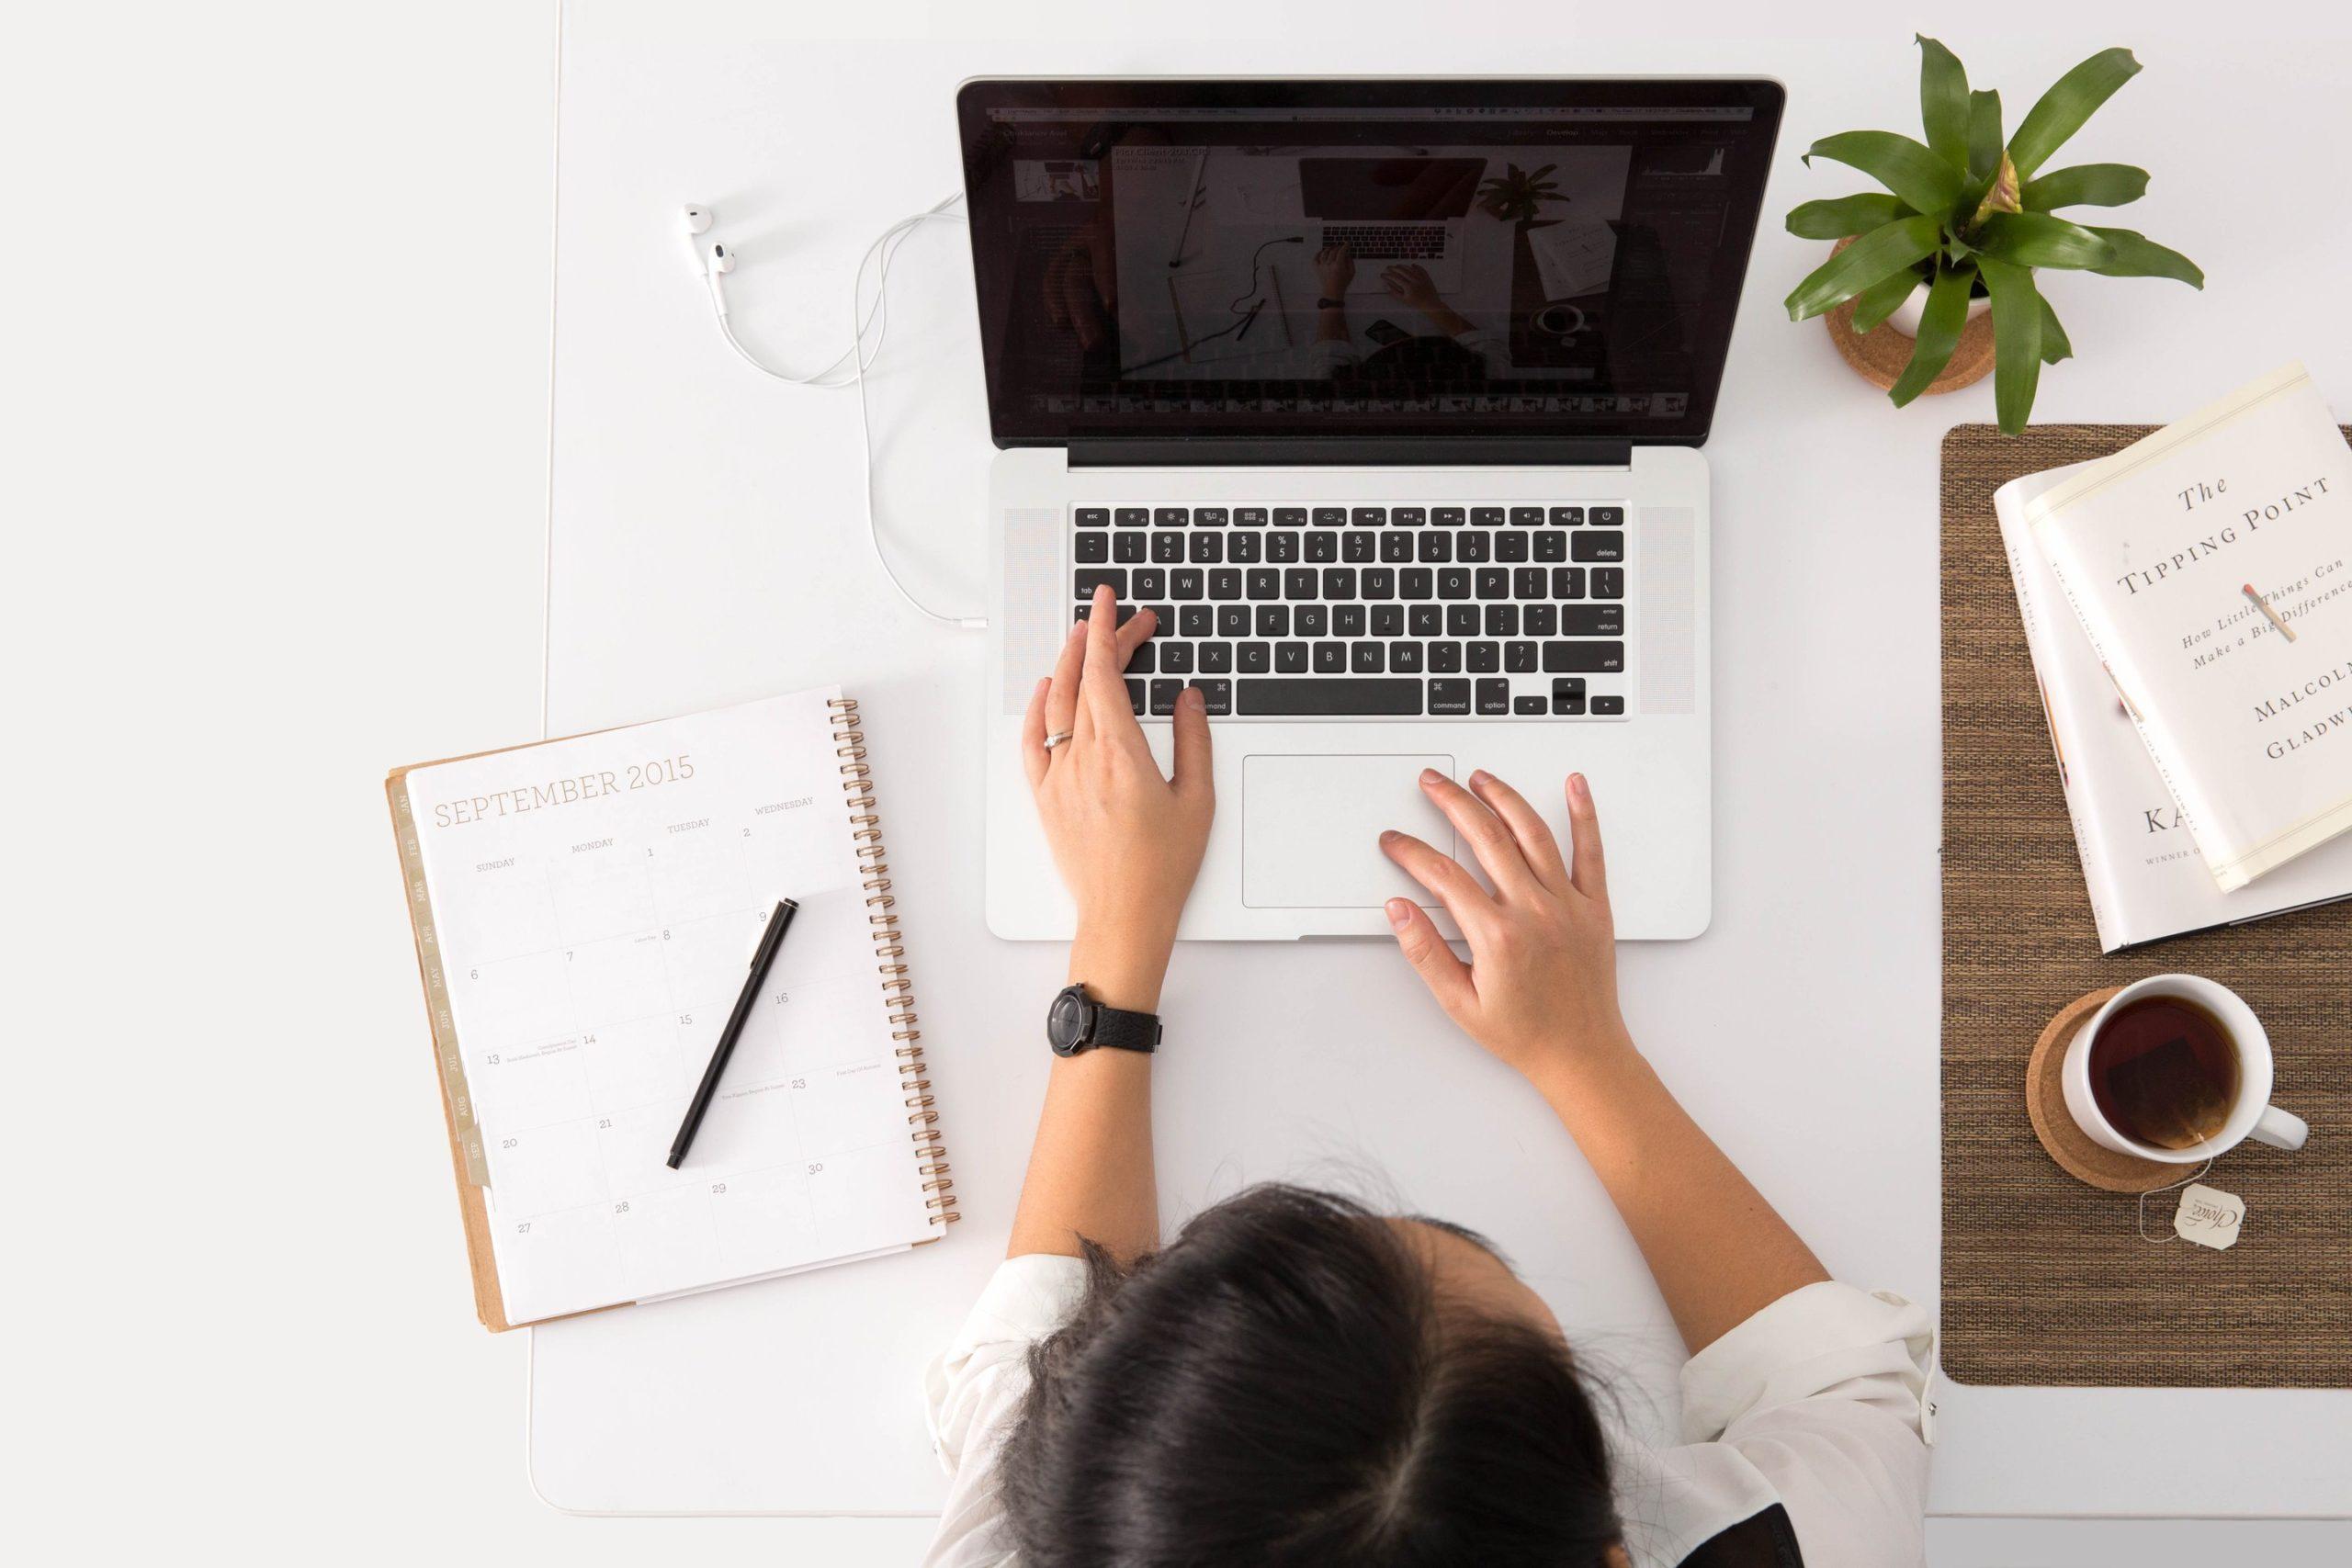 Techqueria Webinar: Creating Boundaries Between Work & Home